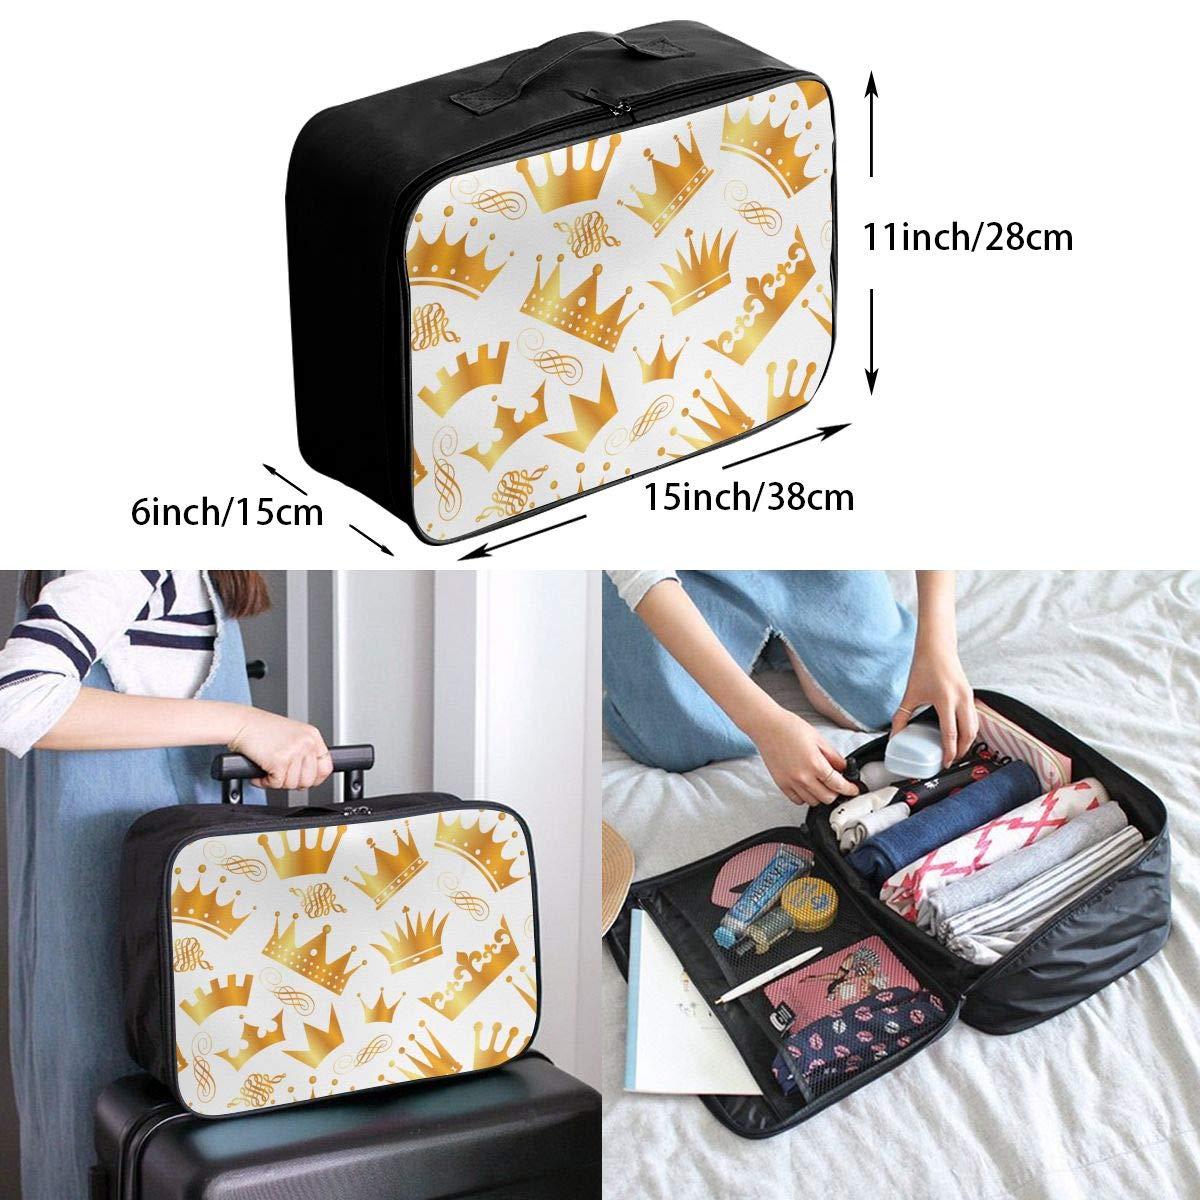 Travel Luggage Duffle Bag Lightweight Portable Handbag Crown Pattern Large Capacity Waterproof Foldable Storage Tote